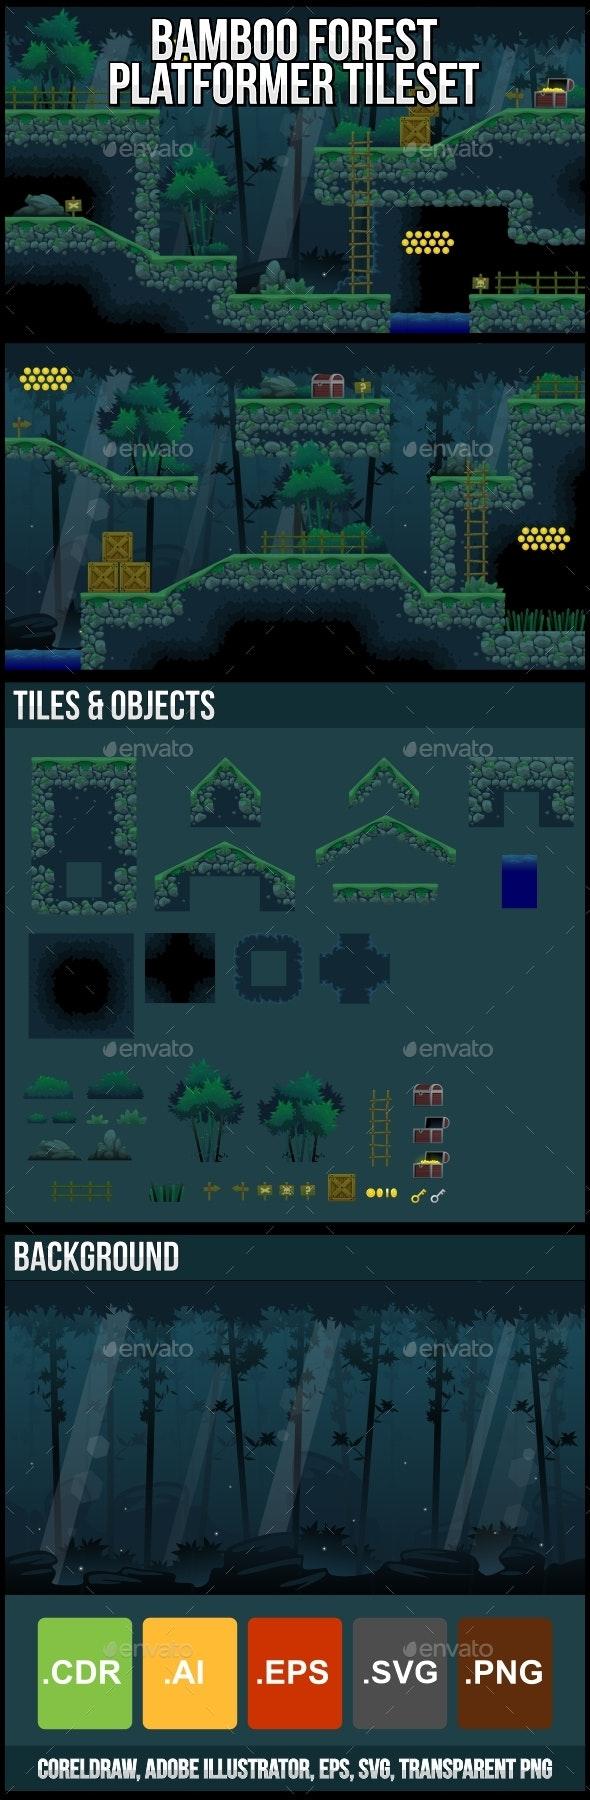 Bamboo Forest - Platformer Tileset - Tilesets Game Assets